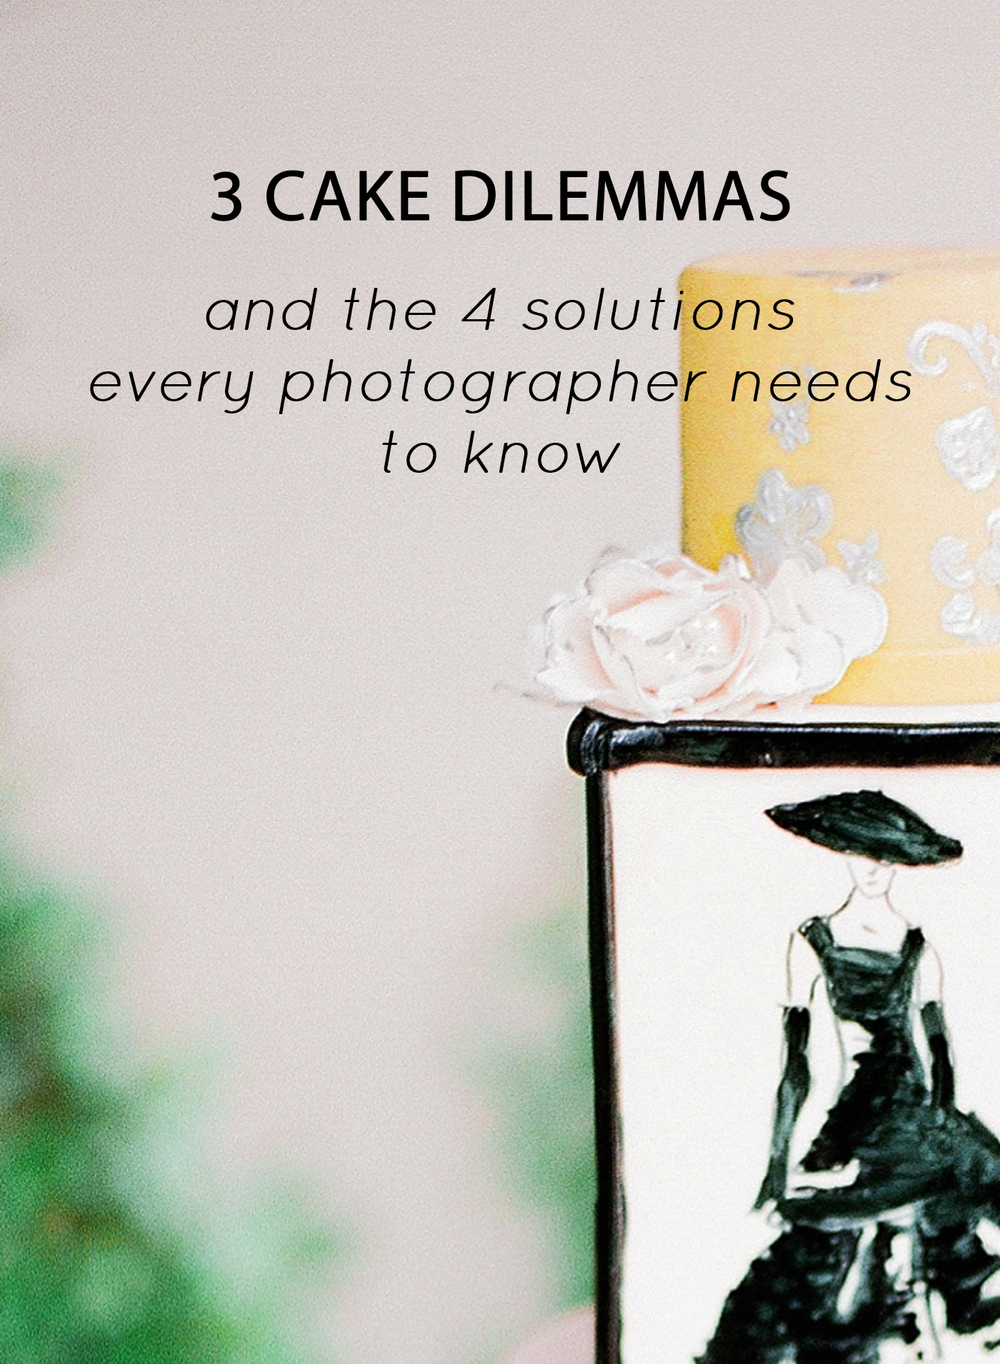 3 Cake Dilemmas and 4 Photo Tips for photographers - St Louis MO Wedding Photographer, Jordan Brittley (jordanbrittley.com)